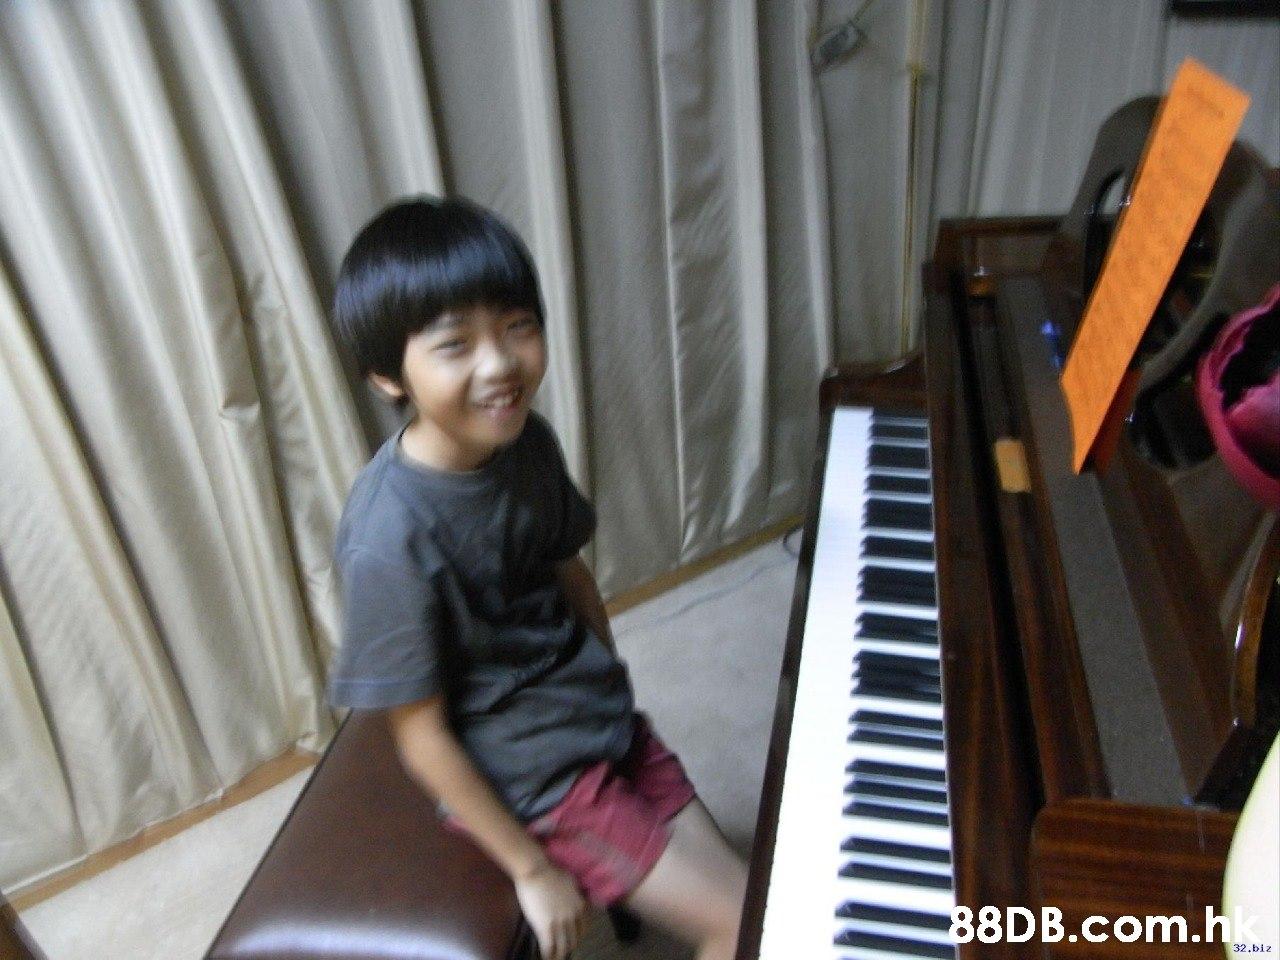 .hk. 32.biz  Piano,Musical instrument,Musical keyboard,Keyboard,Pianist